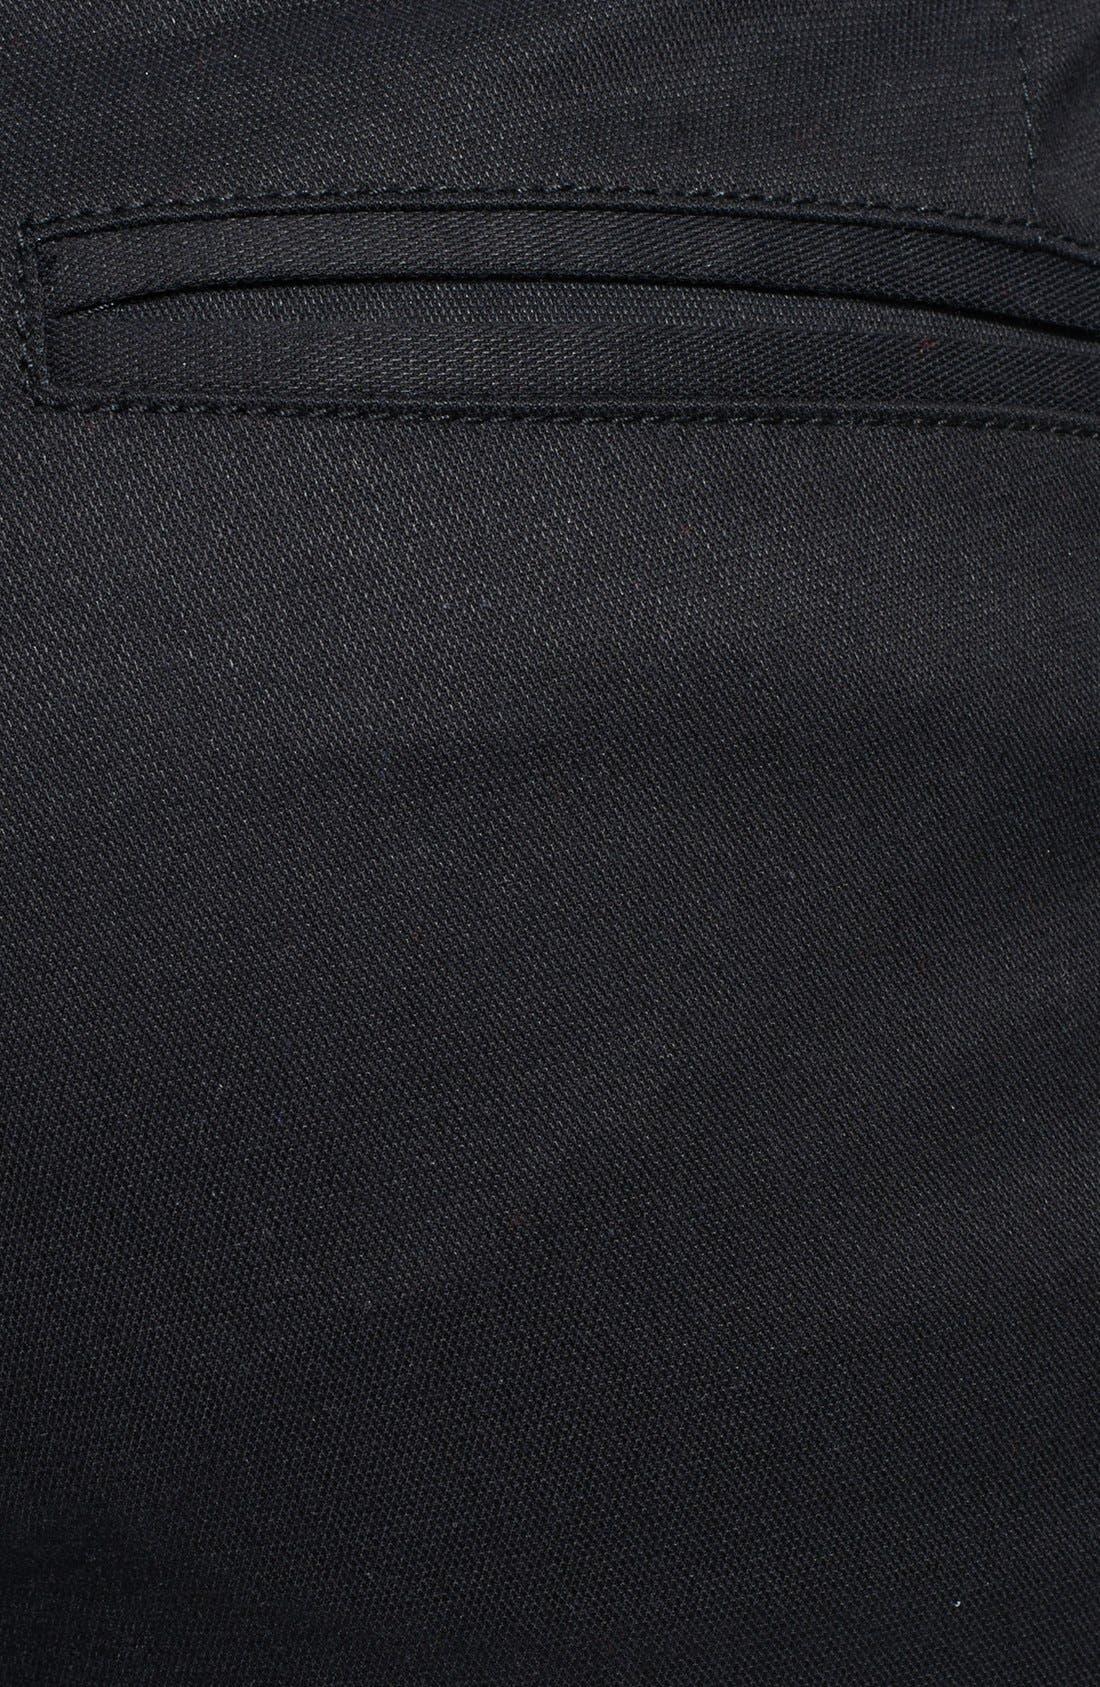 Alternate Image 3  - Burberry Brit 'Cawston' Skinny Fit Pants